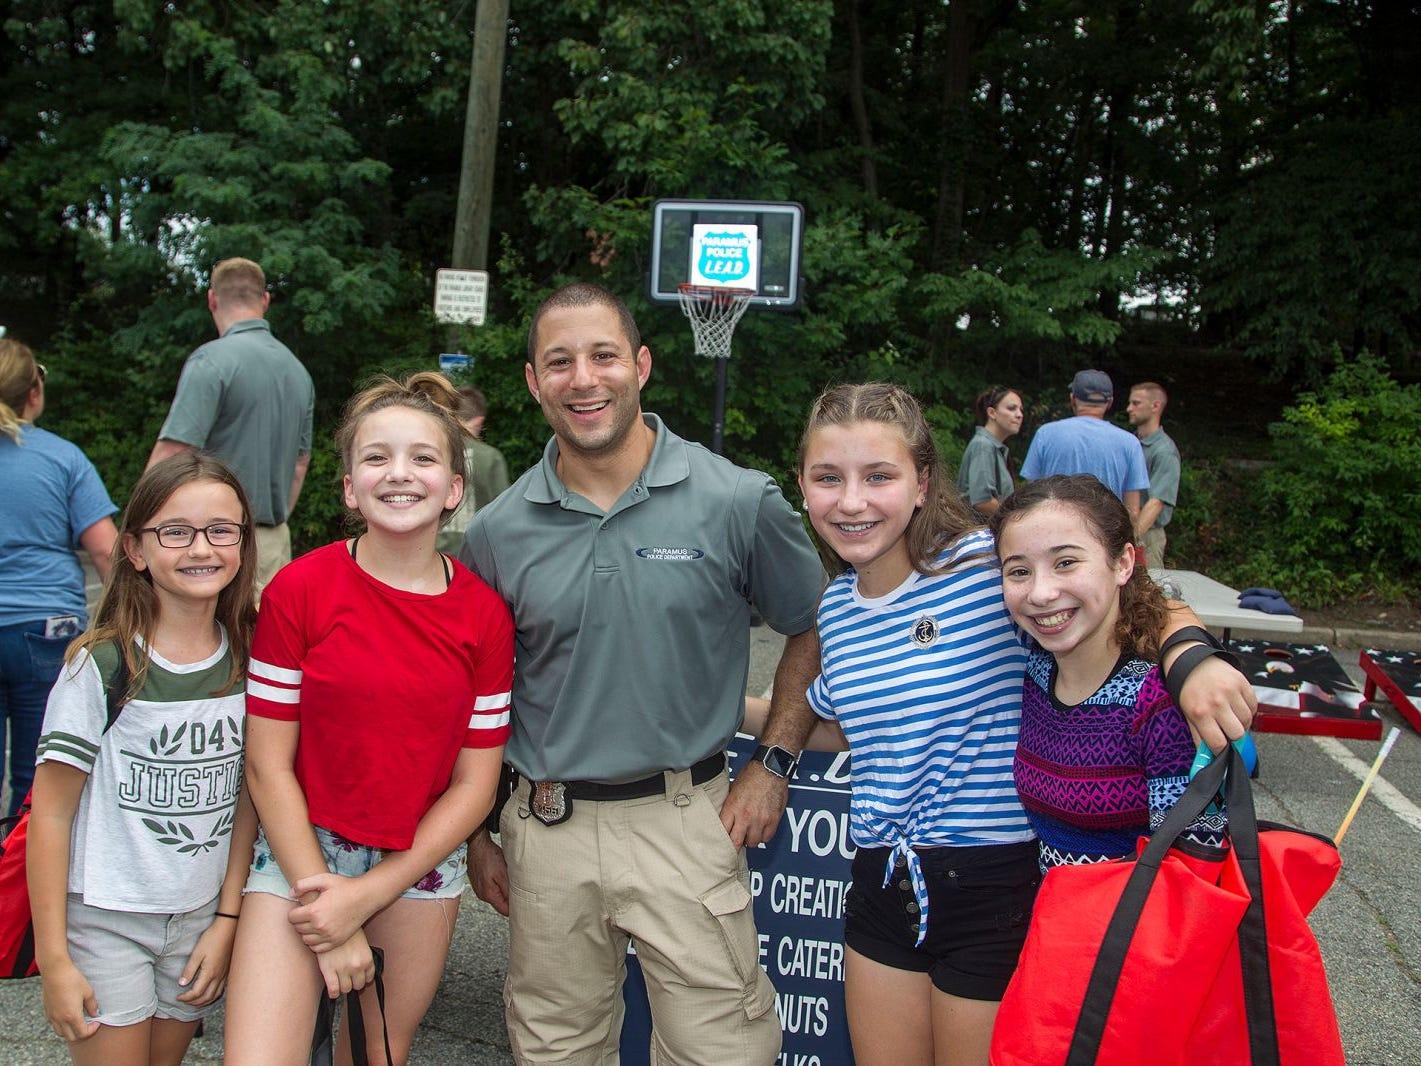 Kaitlyn, Marissa, Officer Cardone, Meghan, Maria. Paramus National Night Out 2018 behind Paramus Library. 08/07/2018